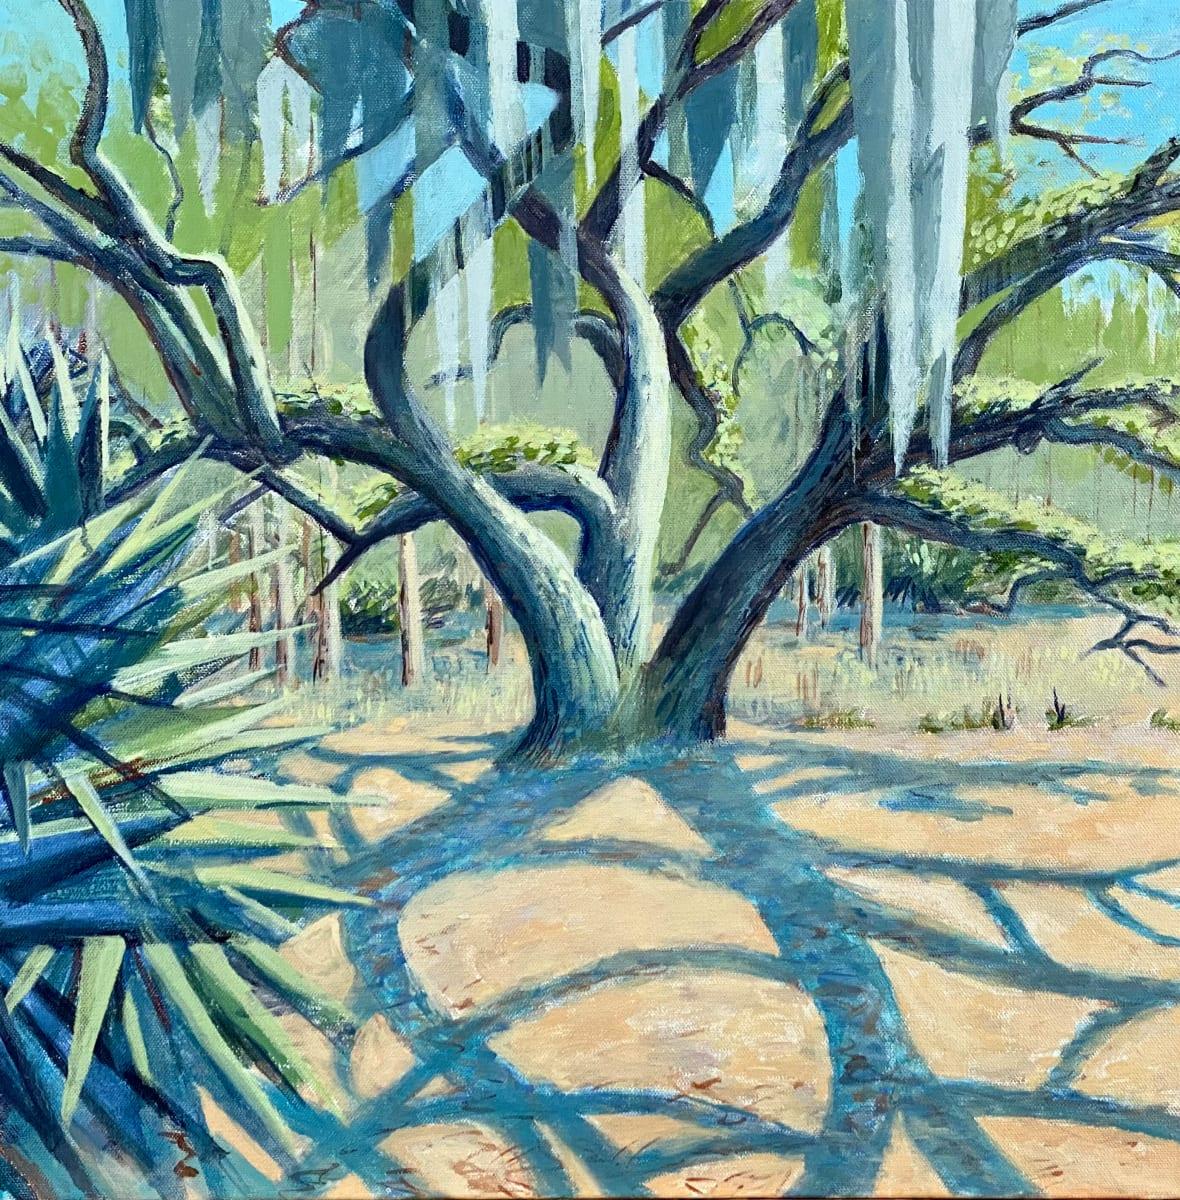 Living Shadows by Jeff Dallas